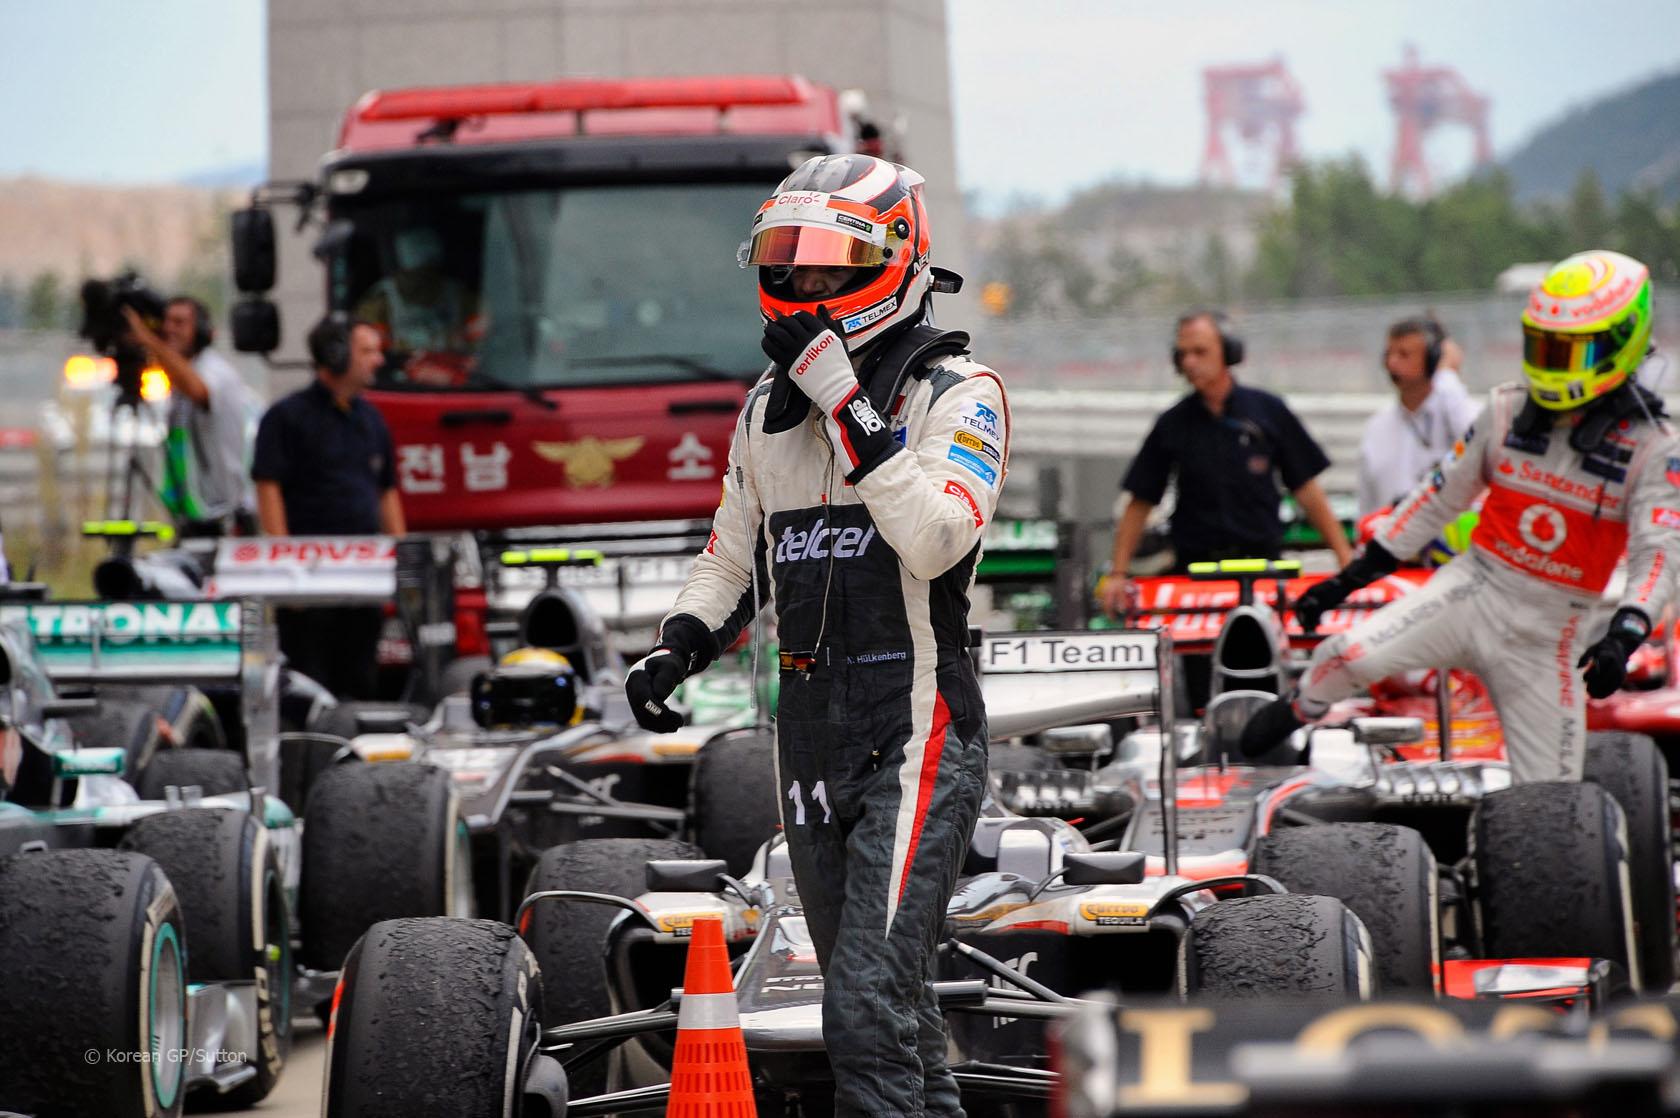 Formula One World Championship, Rd14, Korean Grand Prix, Race Day, Korea International Circuit, Yeongam, South Korea, Sunday 6 October 2013.